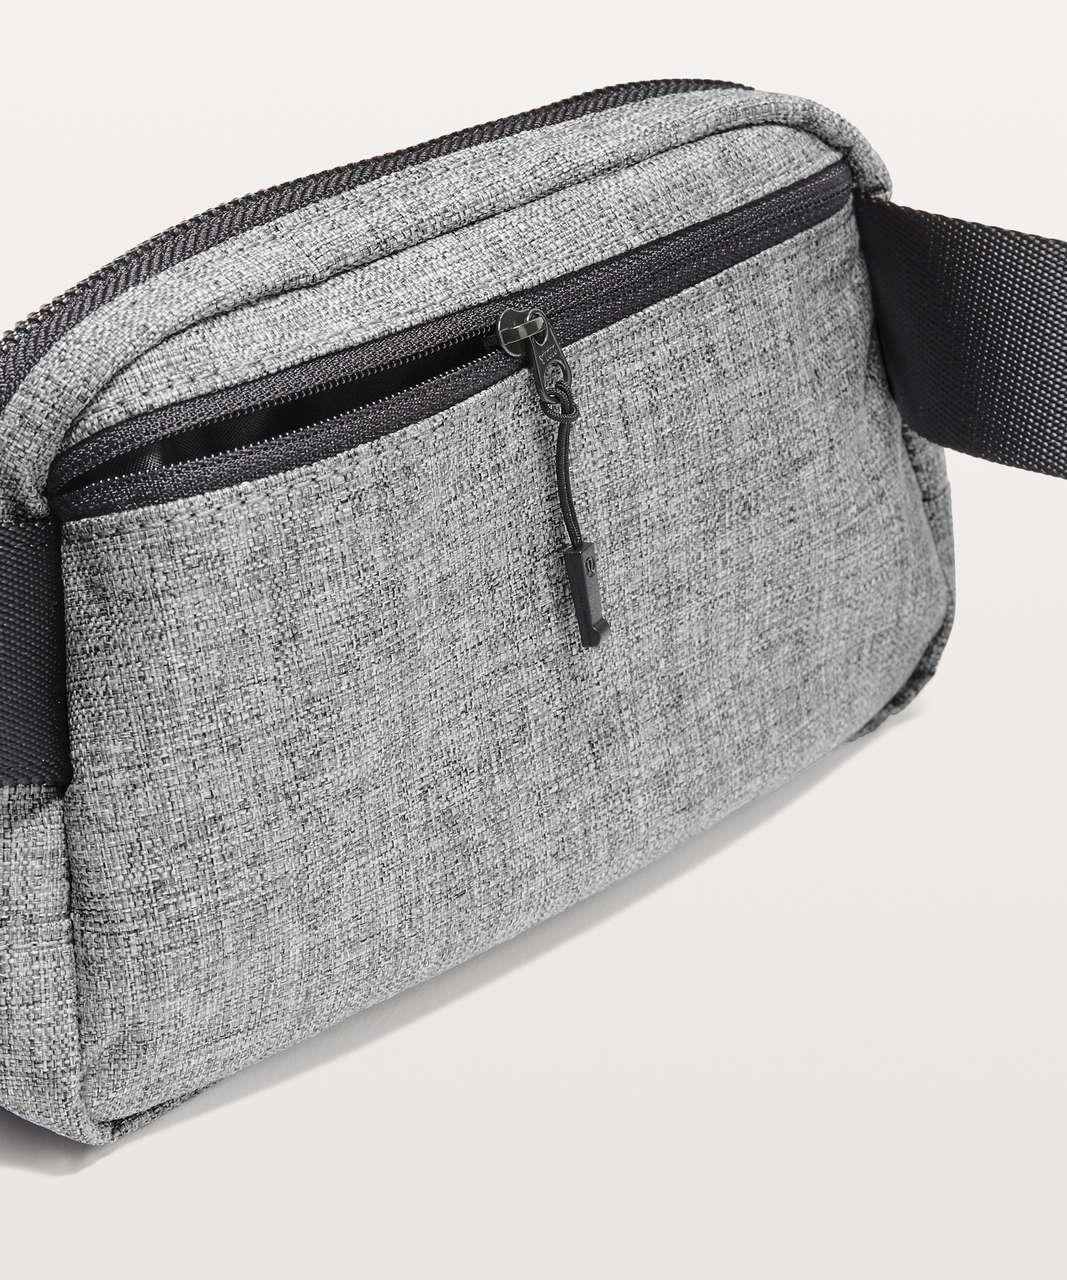 Lululemon Everywhere Belt Bag *1L - Heathered Black / Black